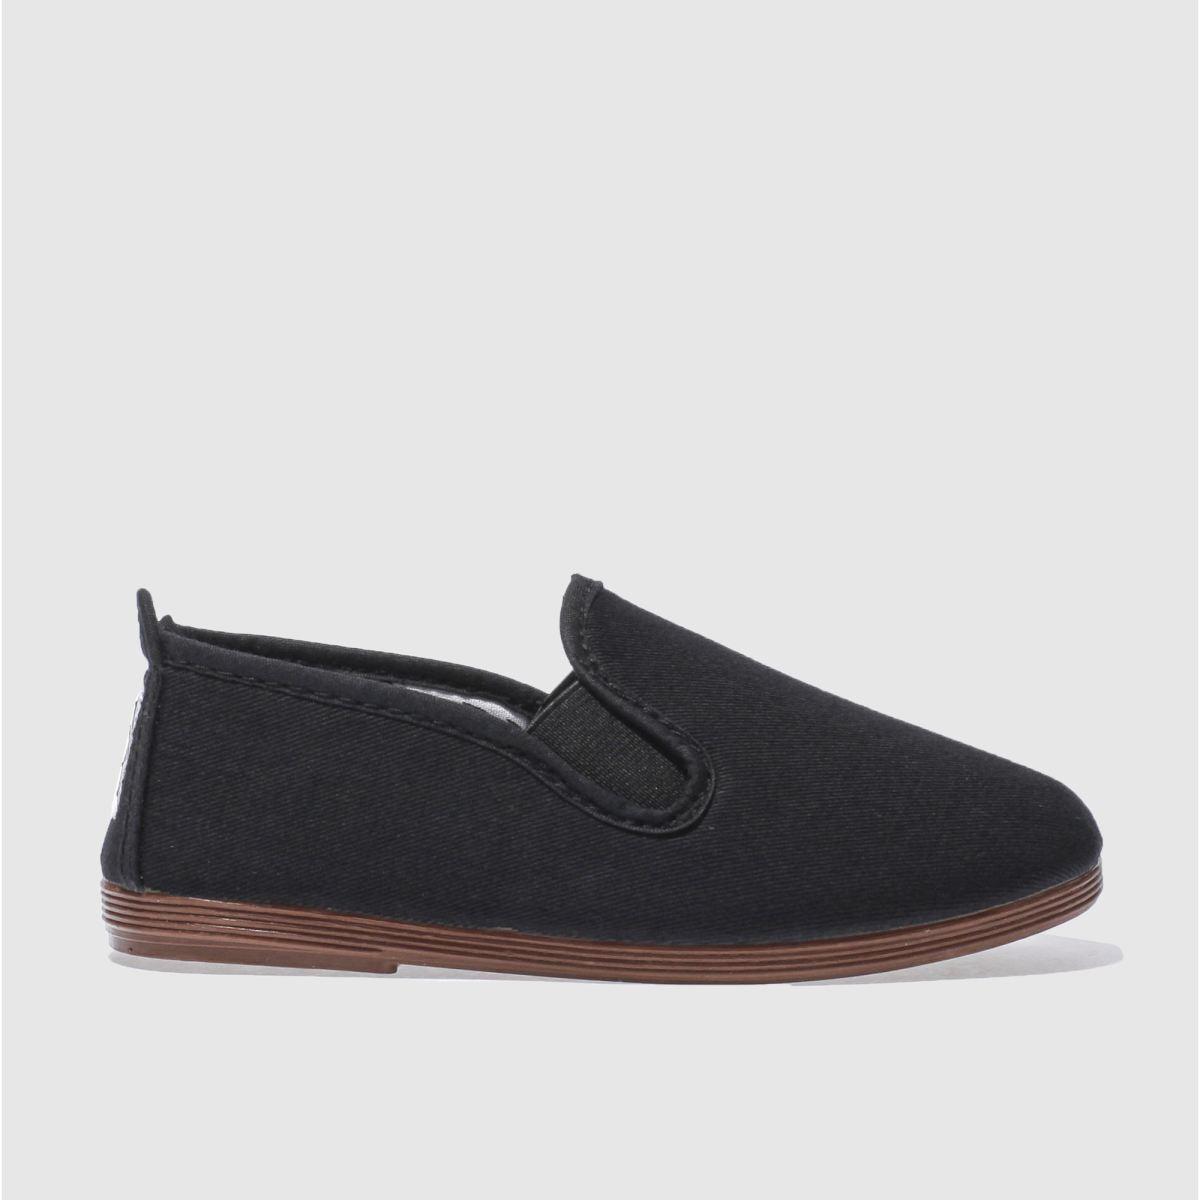 Flossy Flossy Black Pamplona Boys Junior Shoes